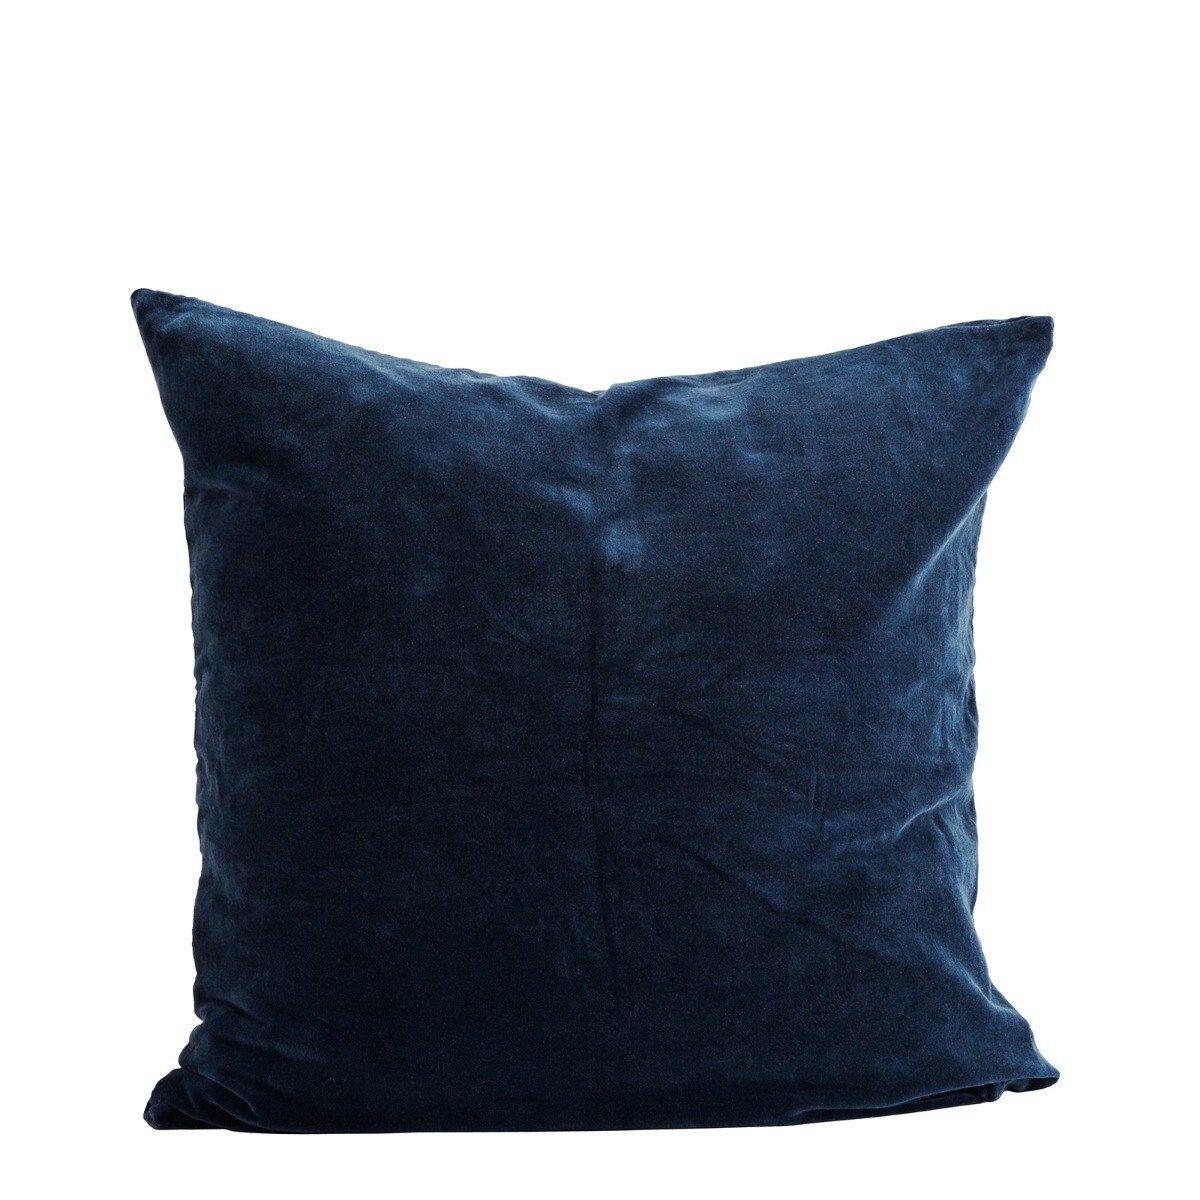 Madam Stoltz kussenhoes blauw velvet 60 x 60